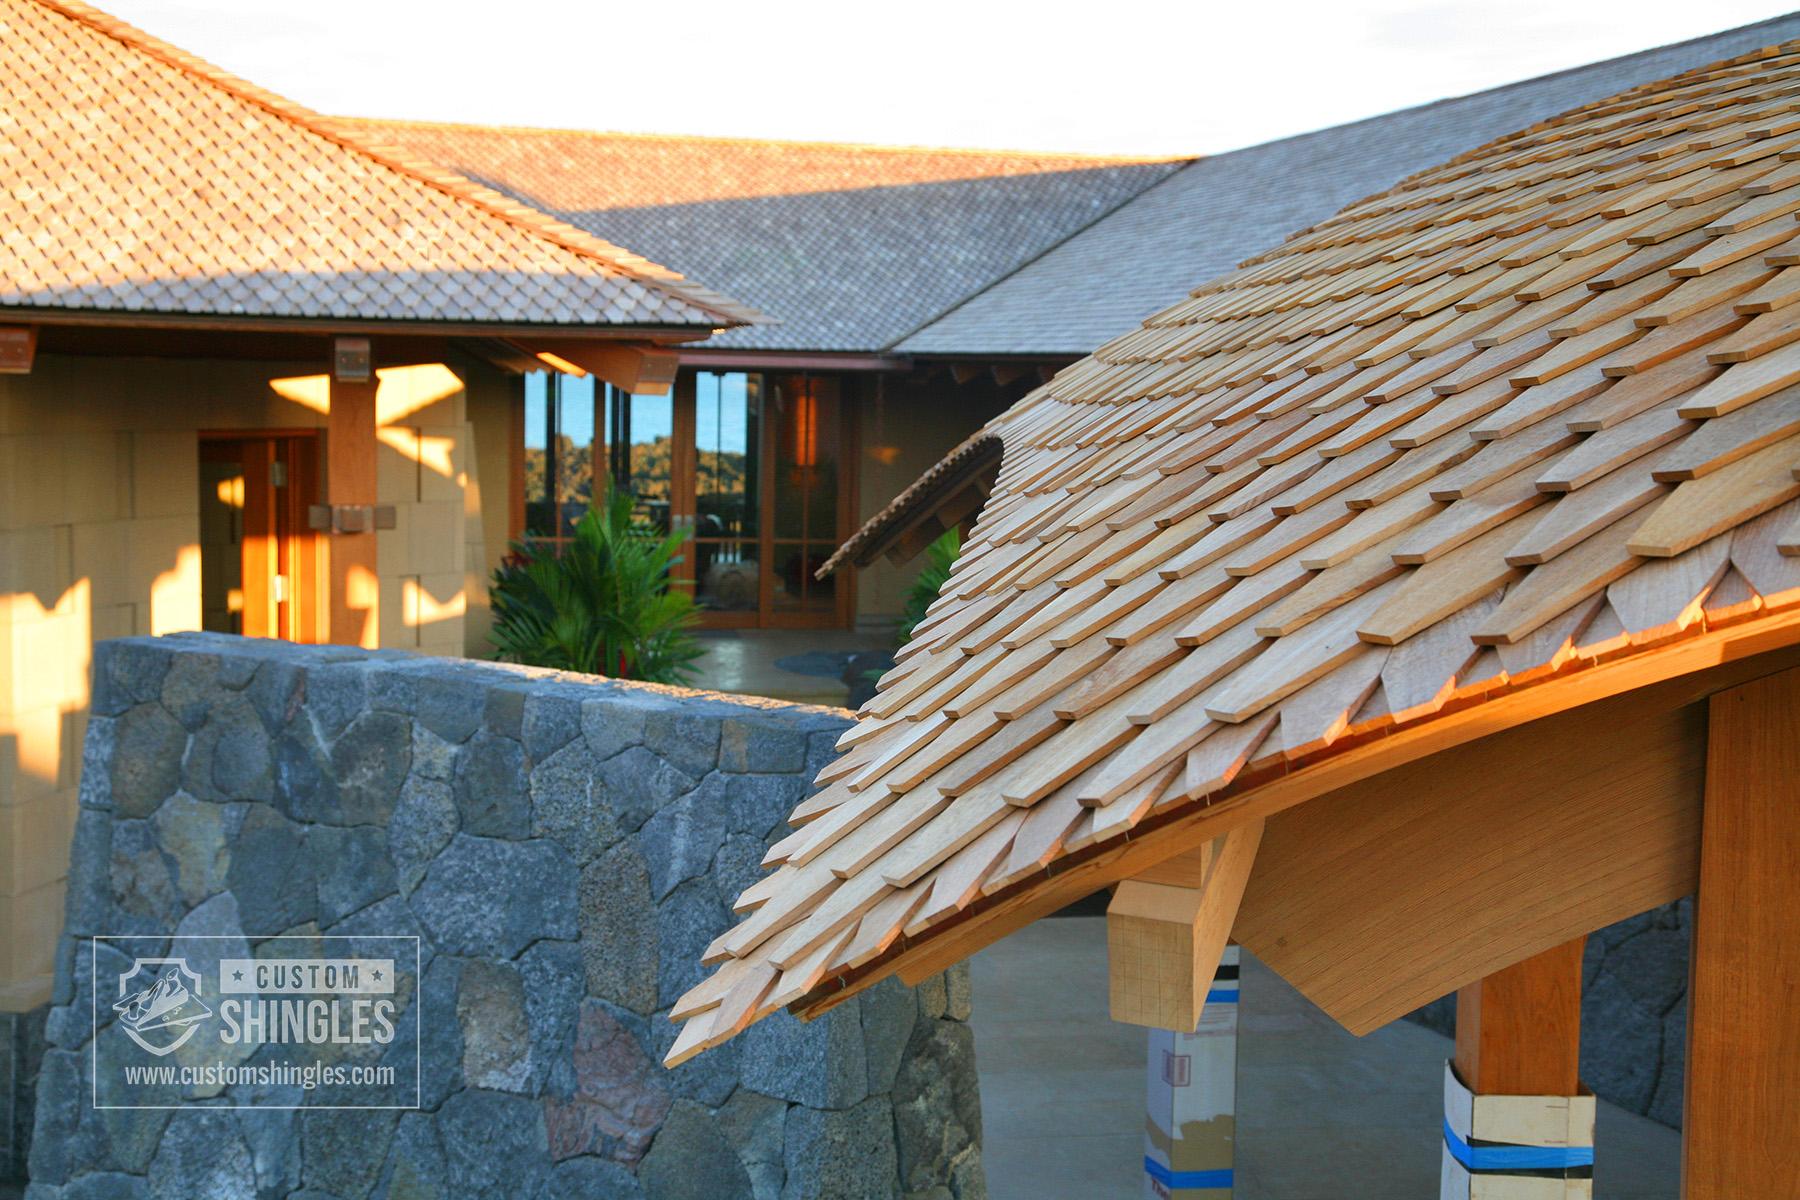 Kona,-Hawaii-Residence-with-Onsite-Steam-Bent-Teak-Shingles-(1) copy.jpg